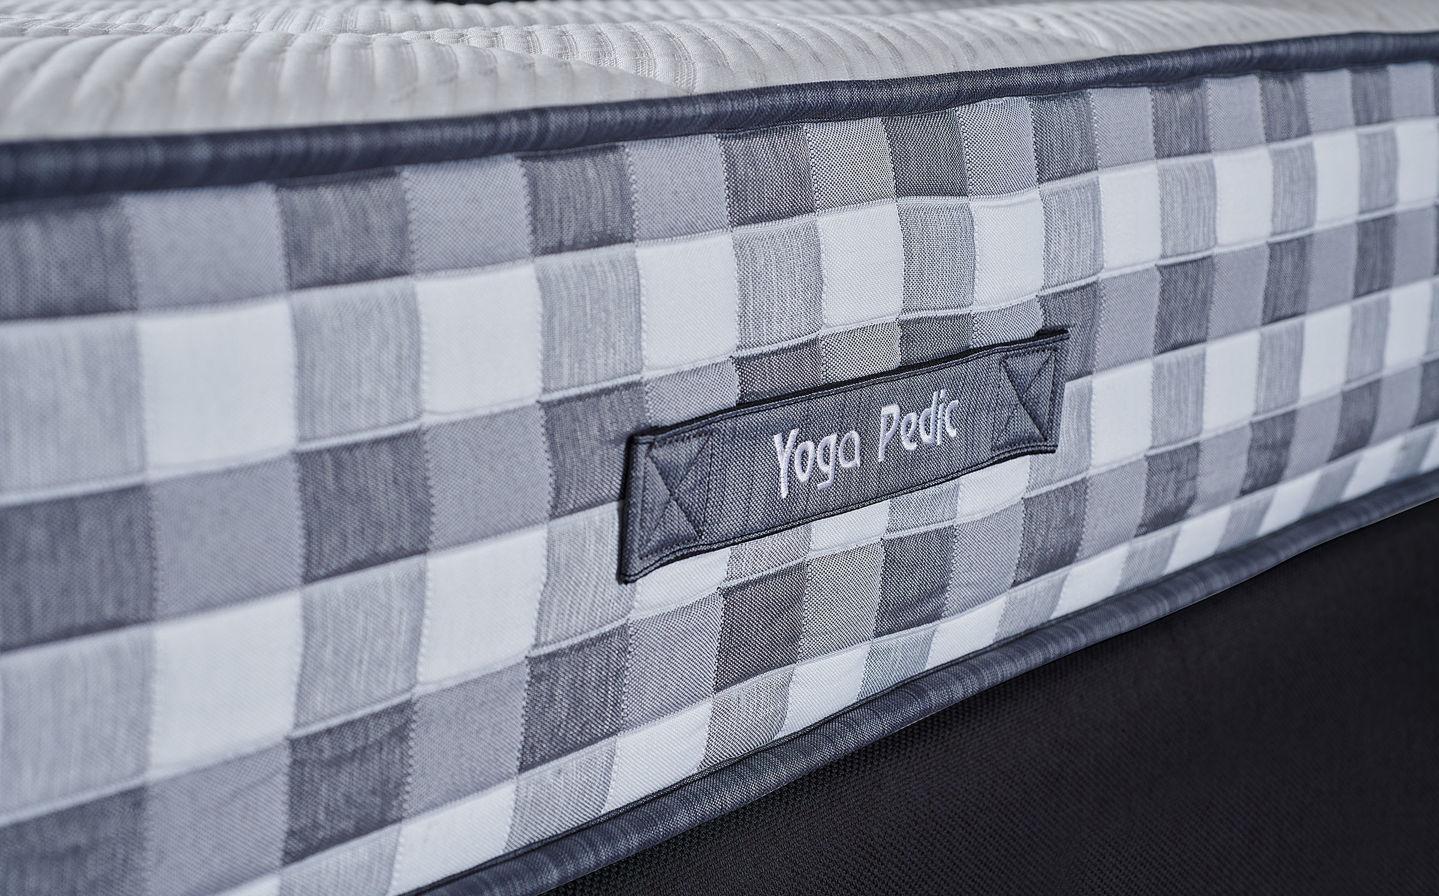 Yoga Pedic Yatak 150 X 200